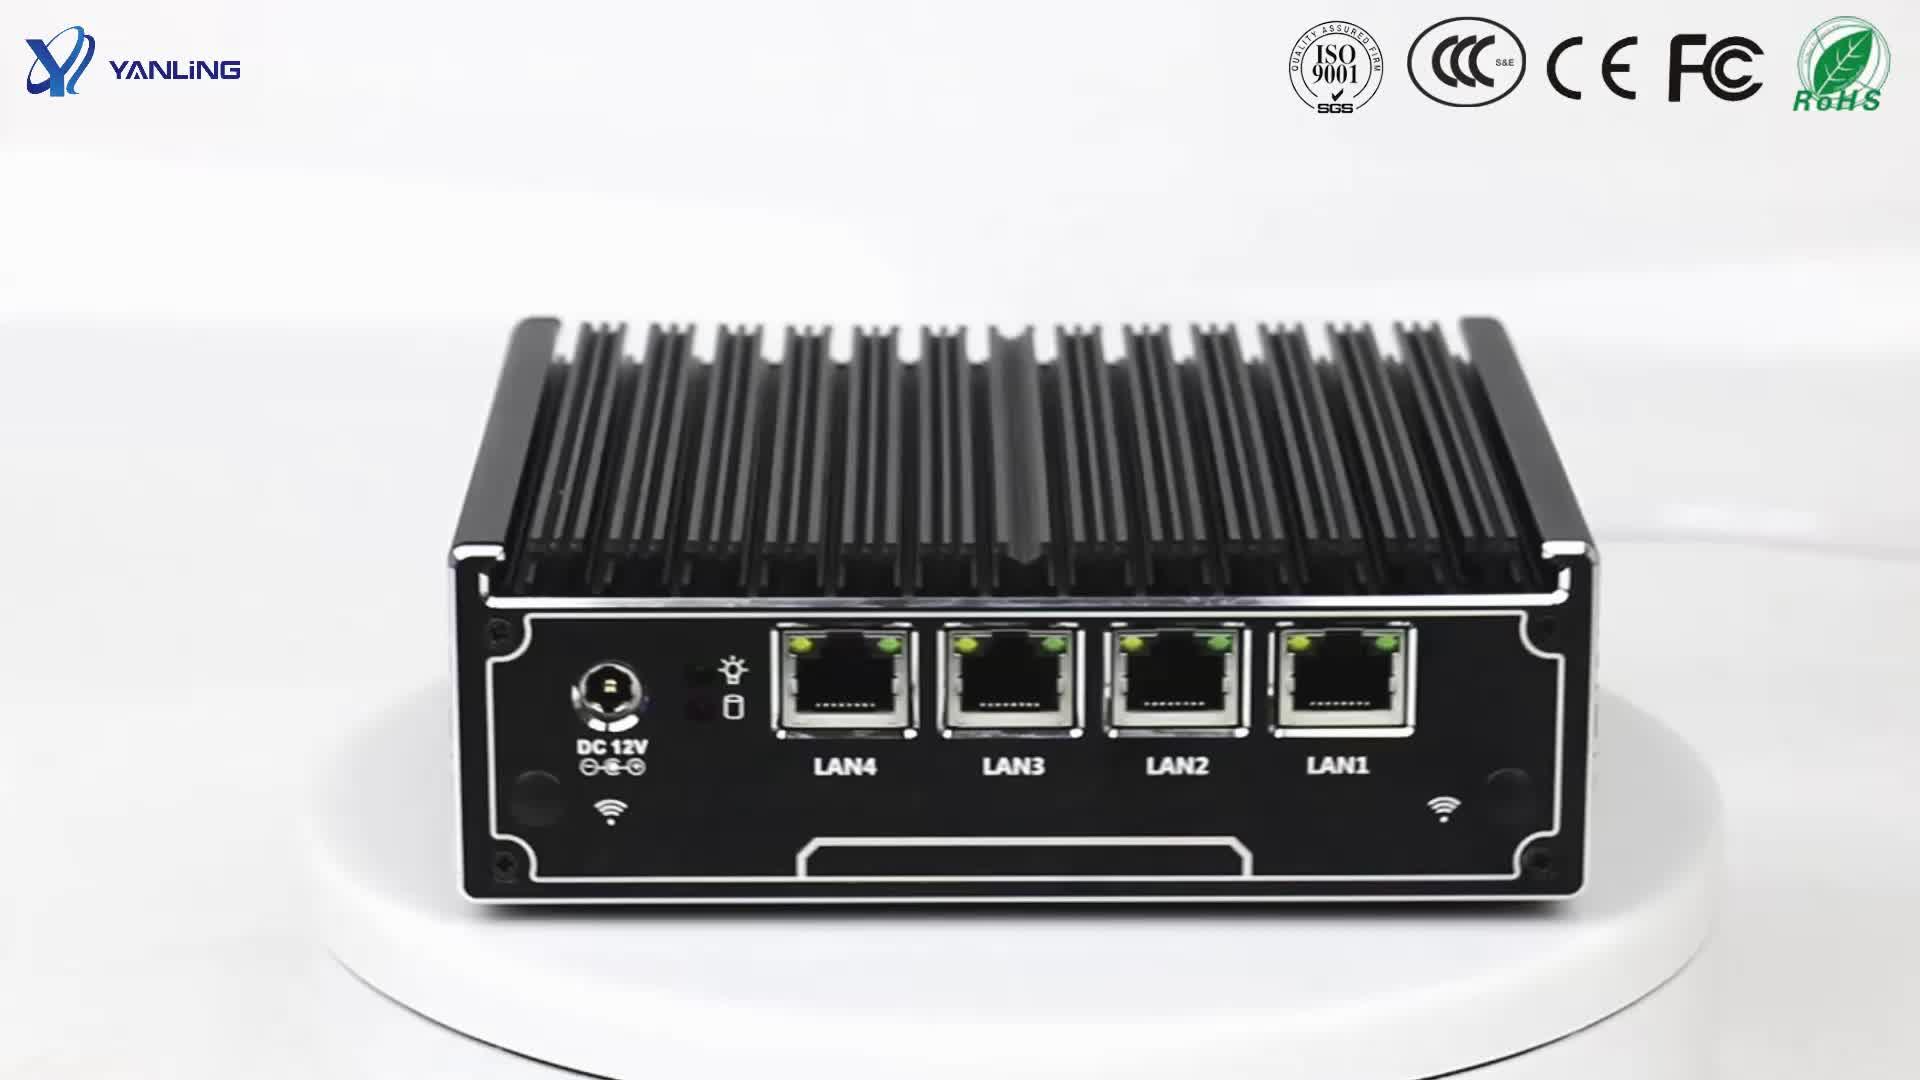 Yanling 卸売インテル J1900 クアッドコアミニ Pc の Linux Pfsnese サーバー 4 Lan ポートファンレスコンピュータと SIM スロット